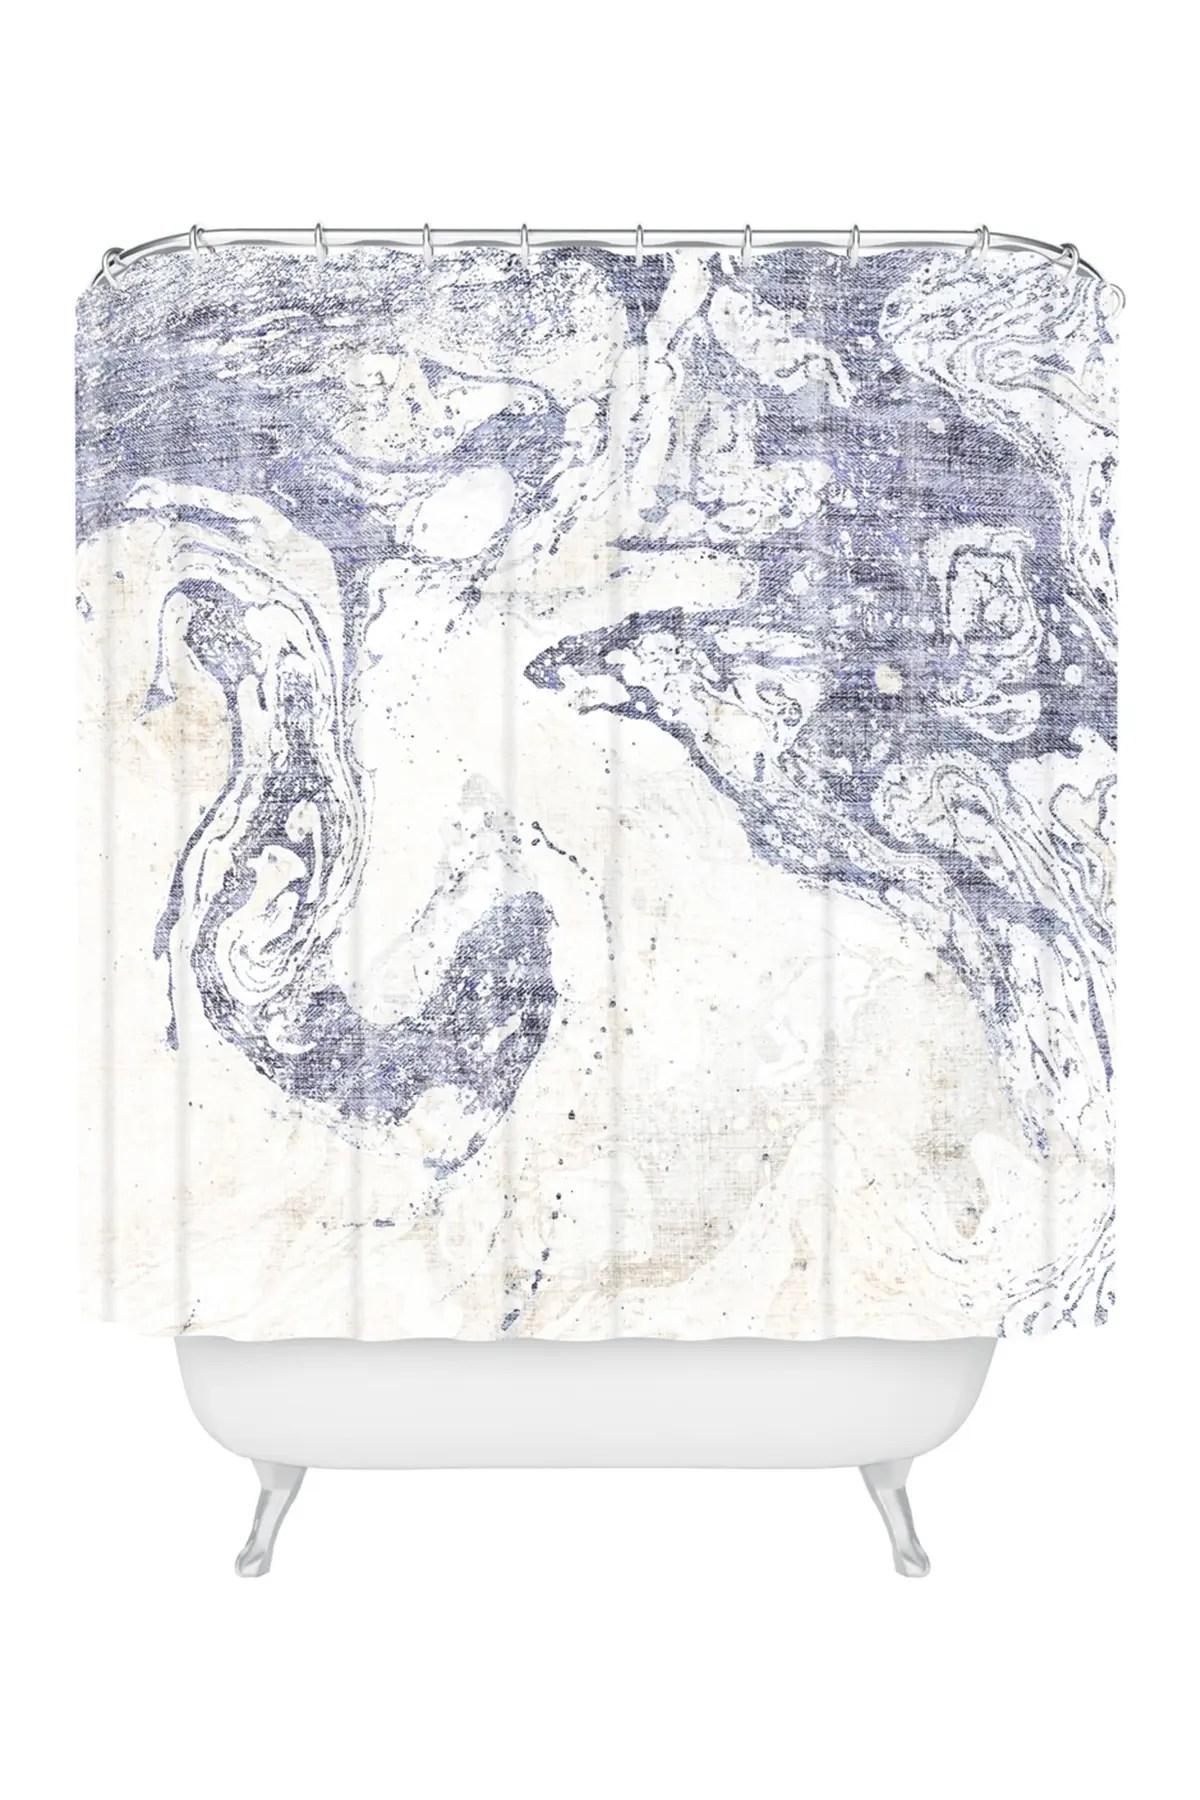 deny designs holli zollinger french shower curtain nordstrom rack